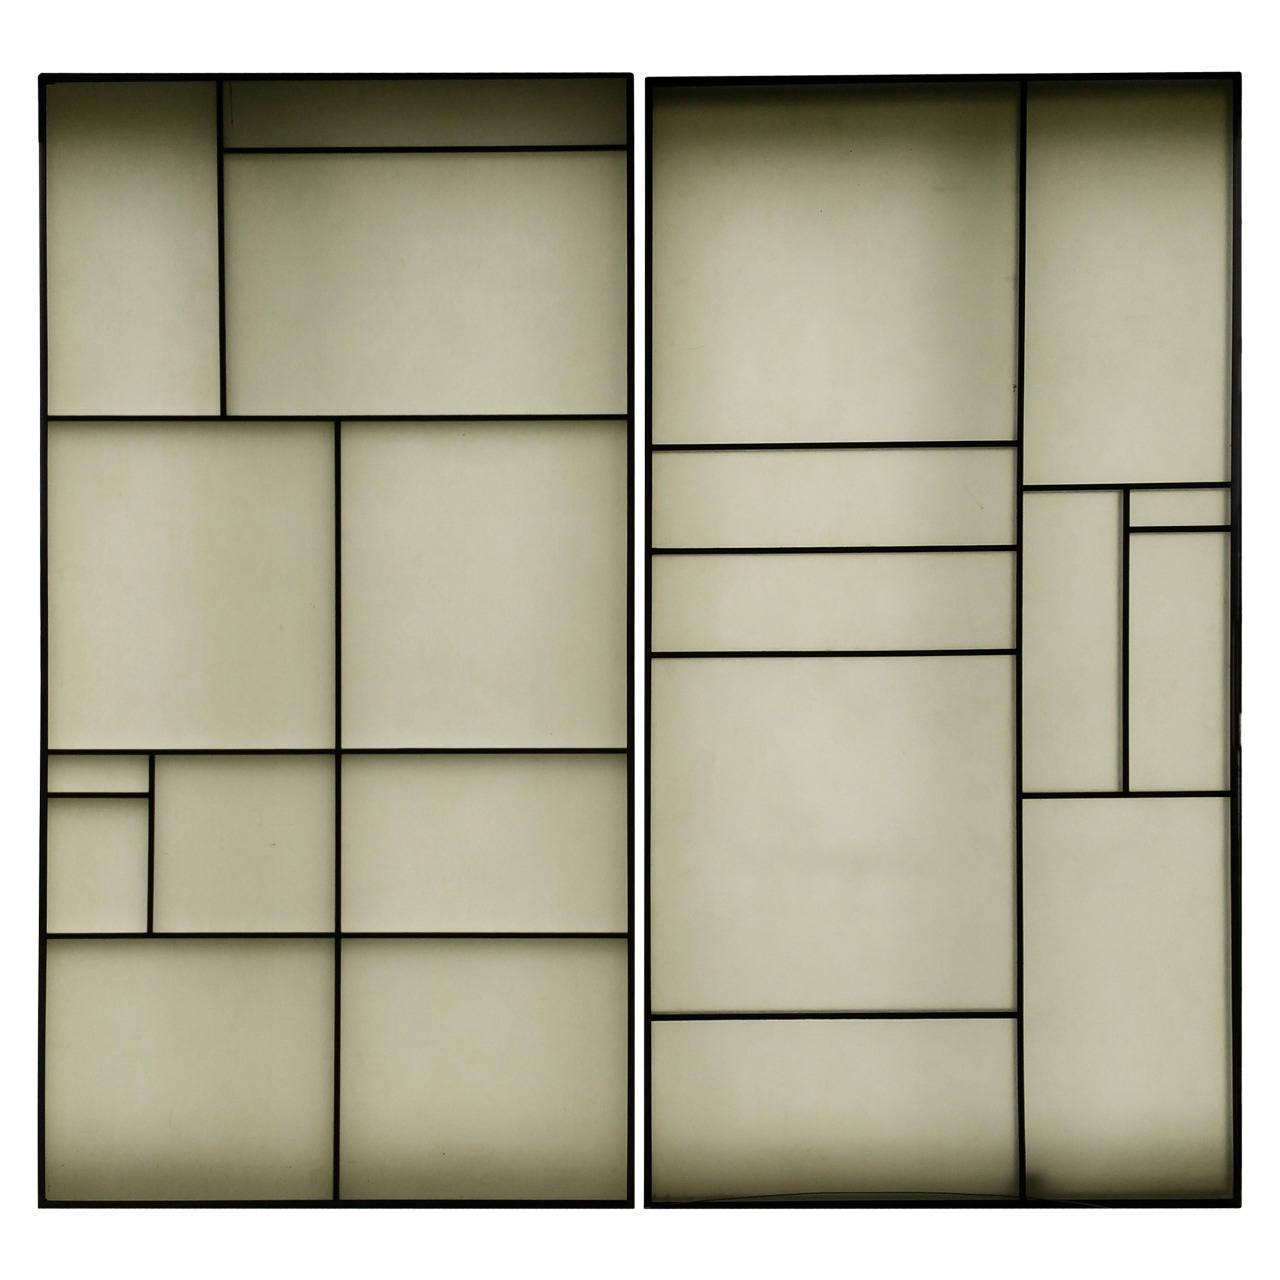 16 Fiberglass Siding Home Design Ideas: Architectural Aluminum And Fiberglass Panels Or Screen